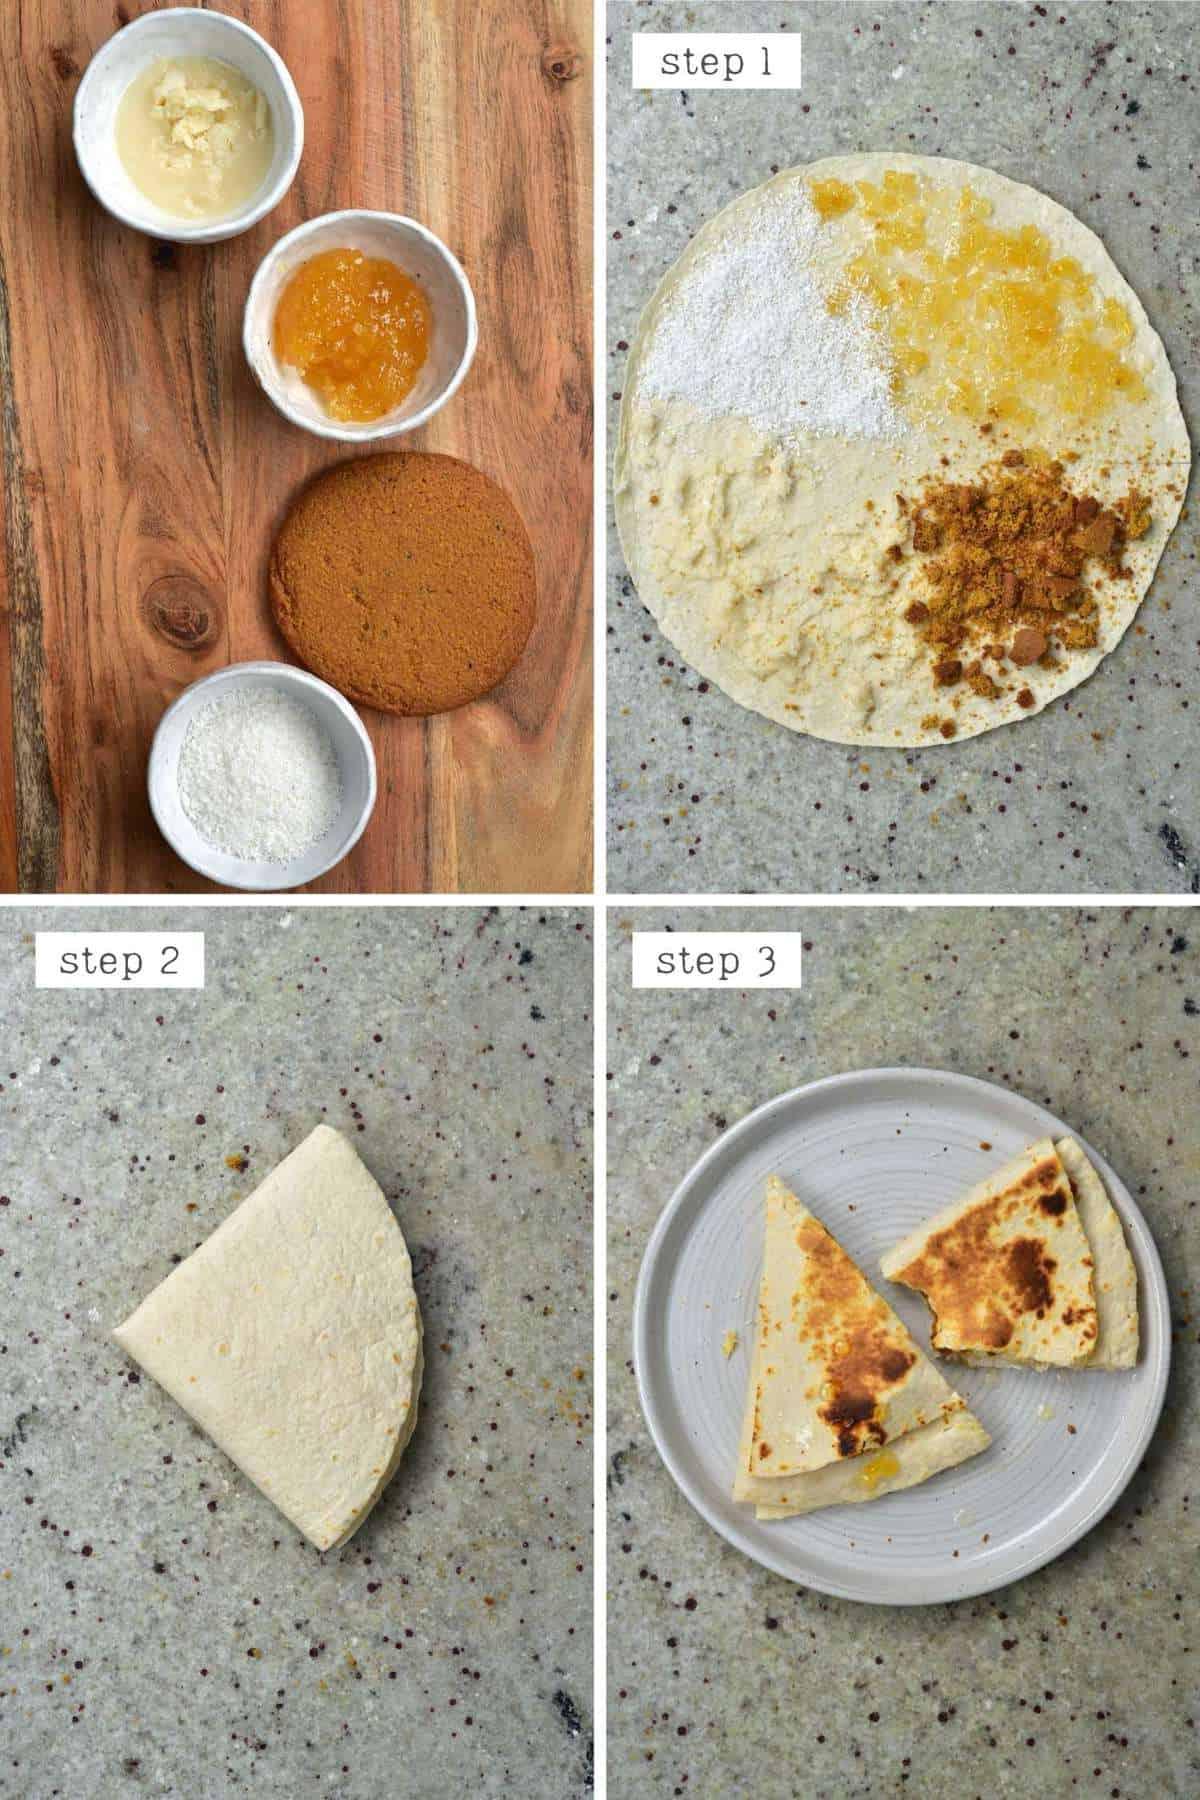 Steps for making ginger jam tortilla